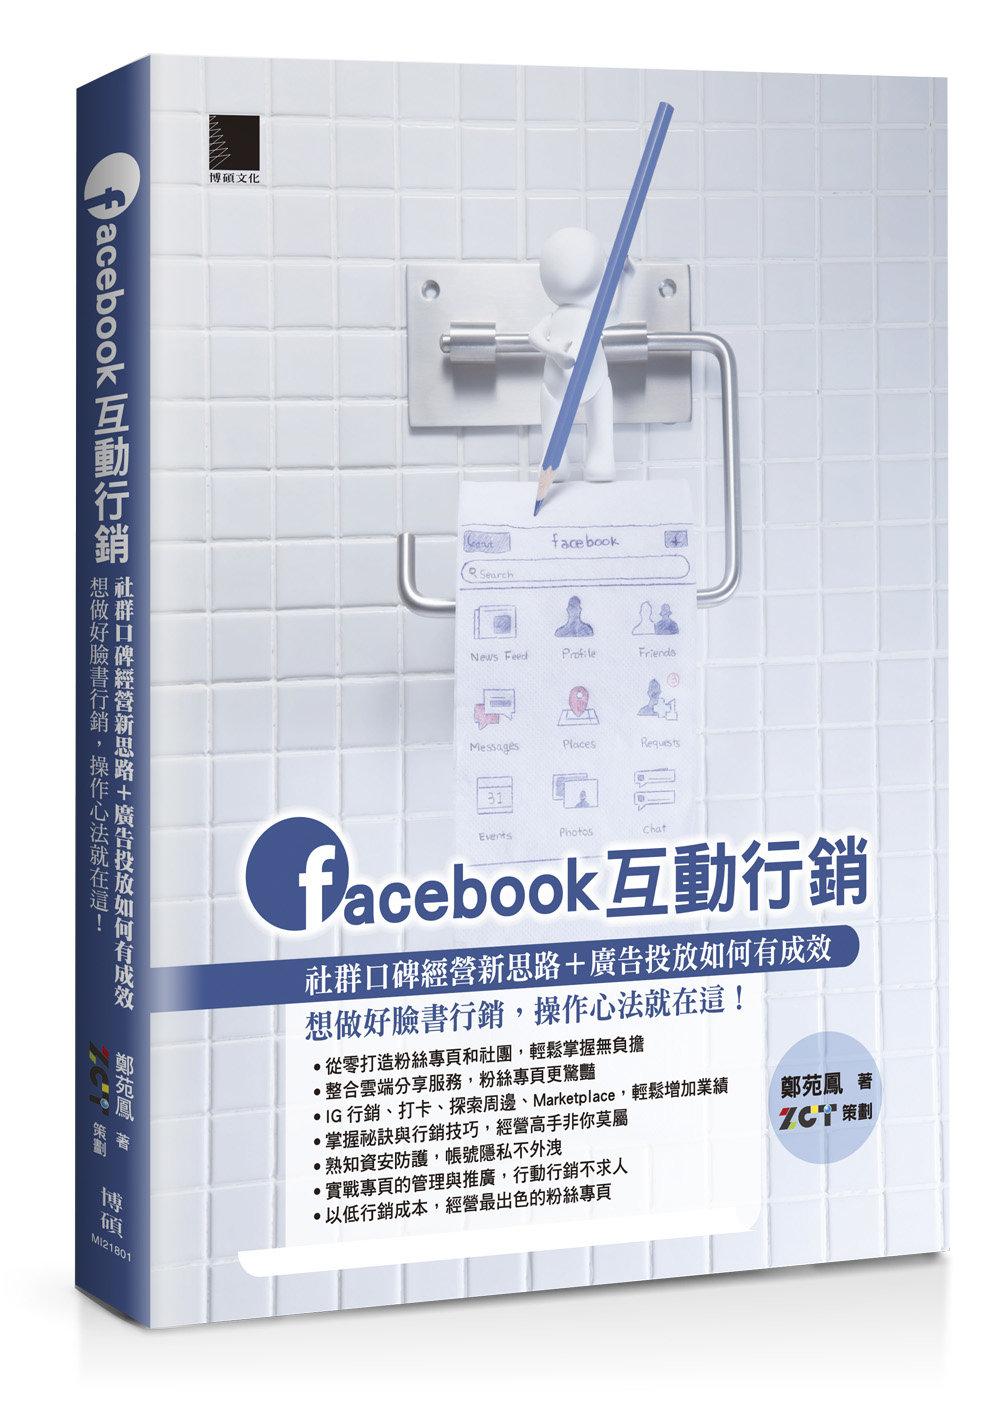 Facebook 互動行銷:社群口碑經營新思路+廣告投放如何有成效,想做好臉書行銷,操作心法就在這!-preview-32